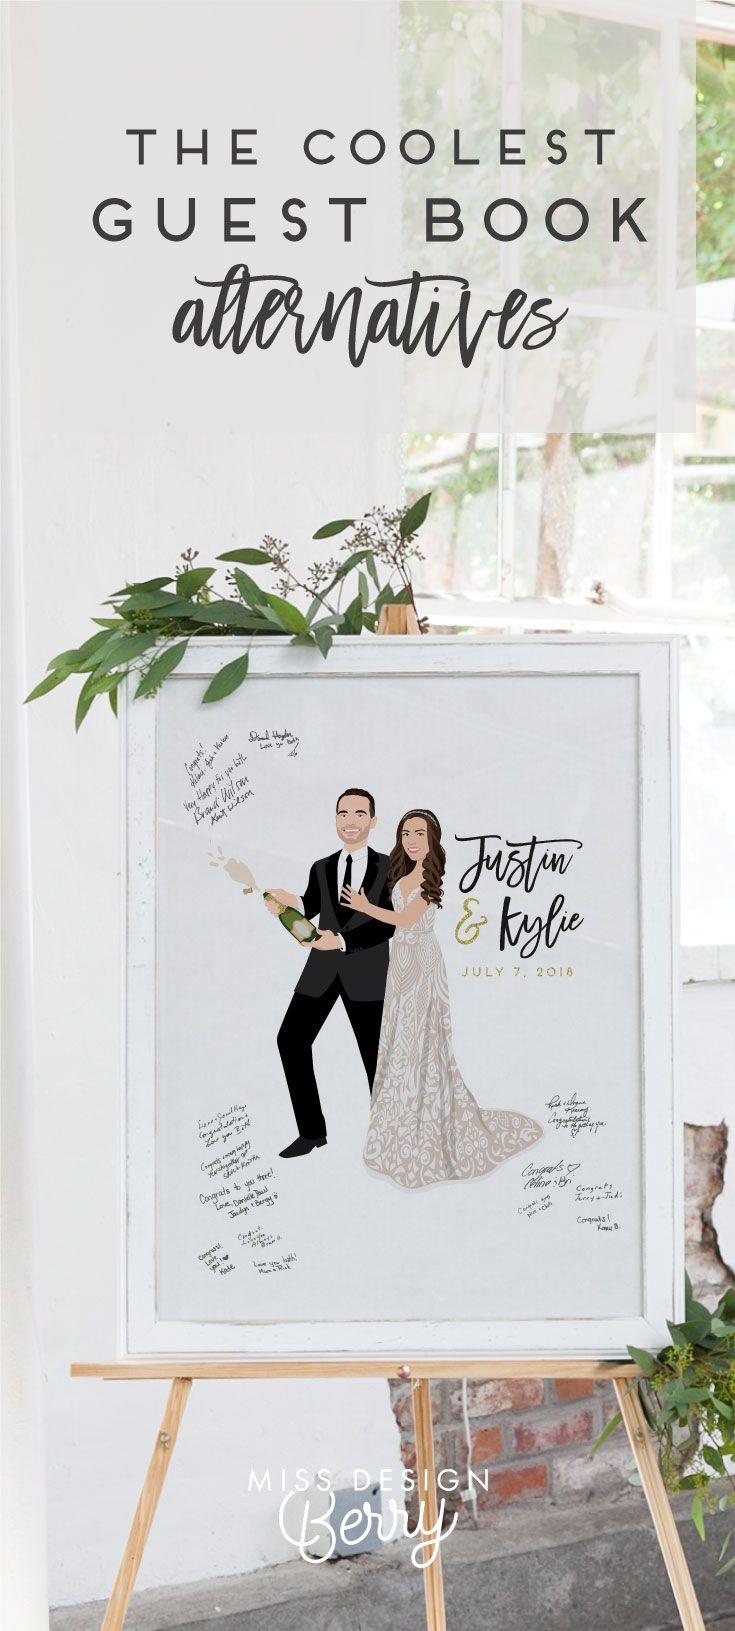 The Coolest Wedding Guest Book Alternatives Wedding Guest Book Unique Wedding Guest Book Alternatives Guest Book Alternatives